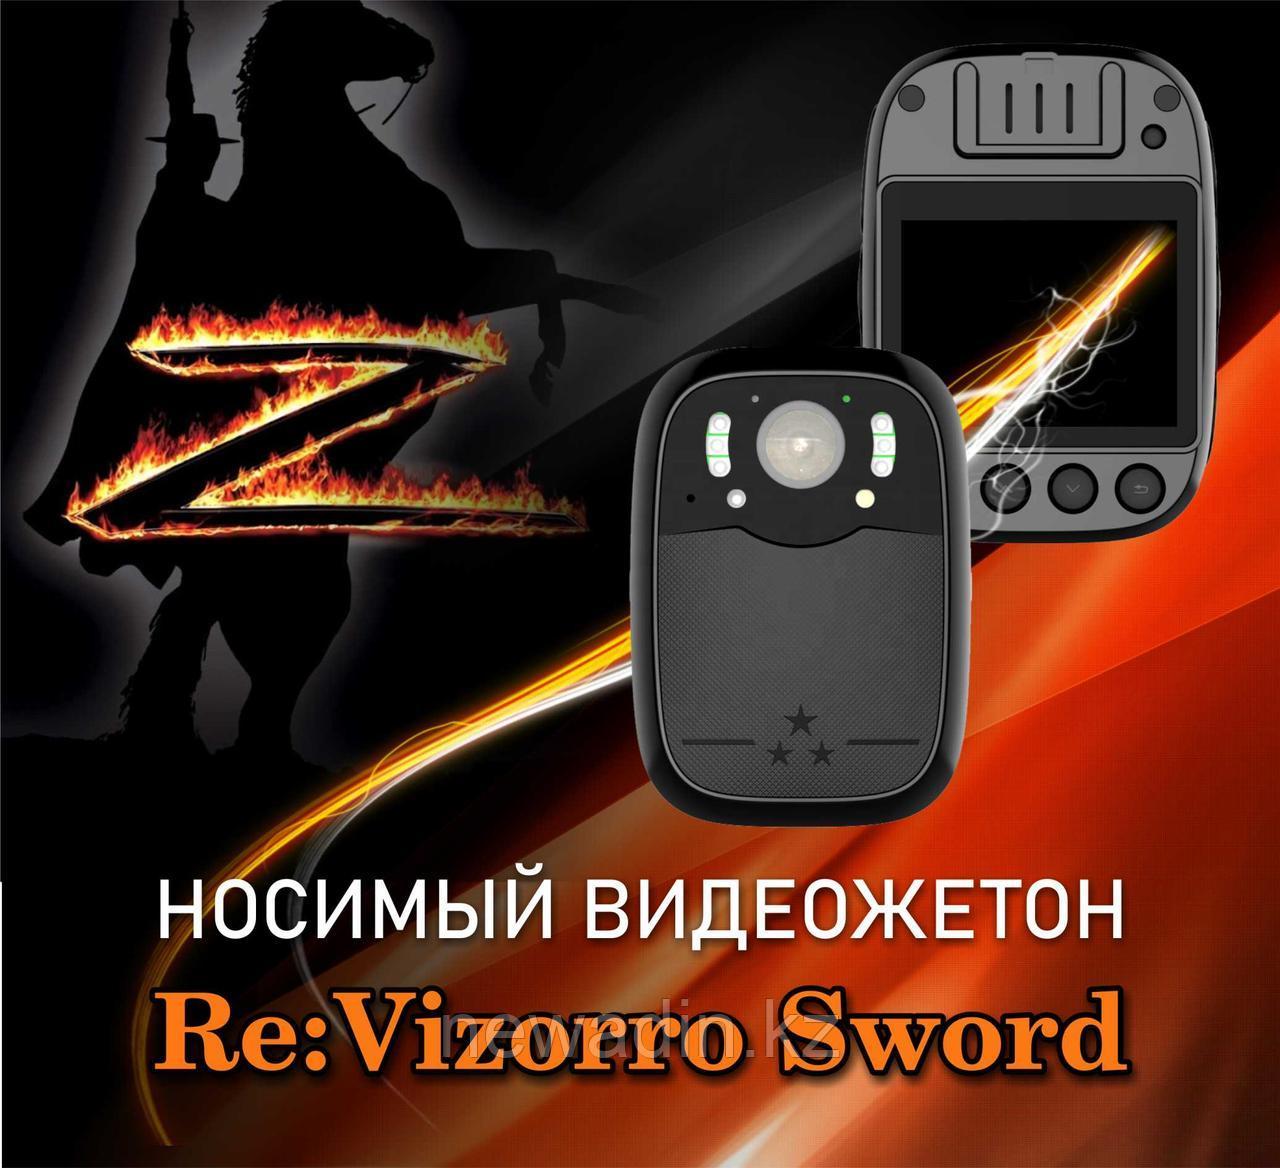 Носимый видеожетон Re:Vizorro Sword